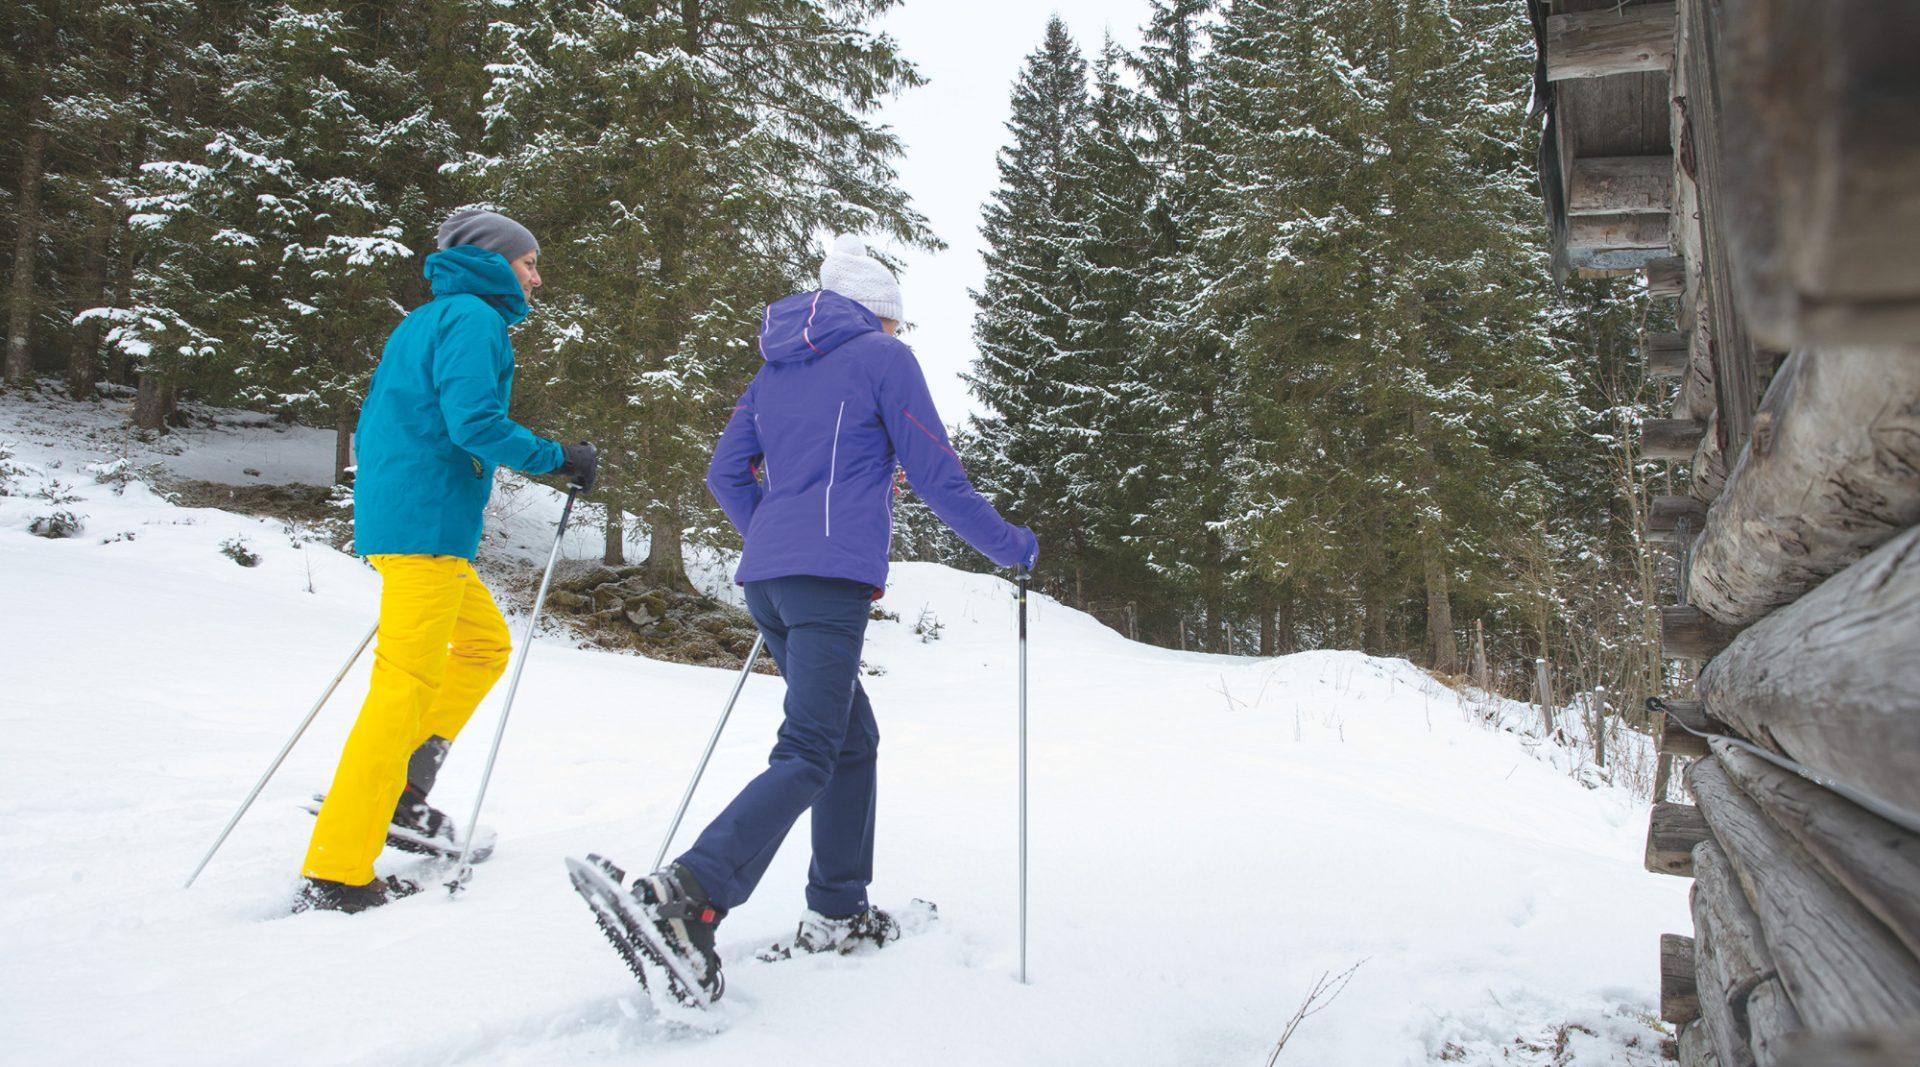 Paar wandert mit Schneeschuhen durch den verschneiten Wald